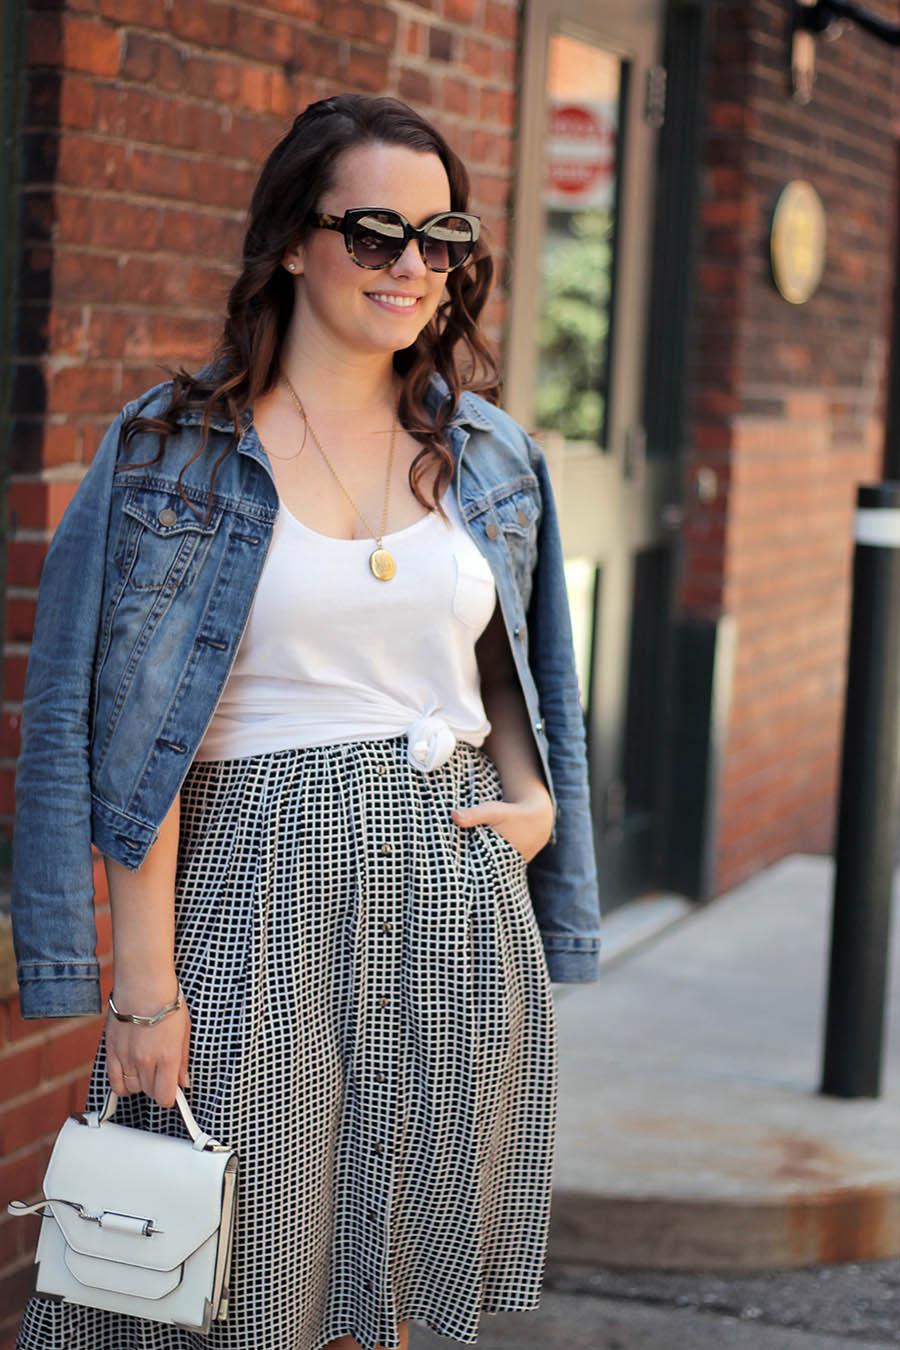 fashion-inspiration-toronto-bloggers-a-side-of-vogue